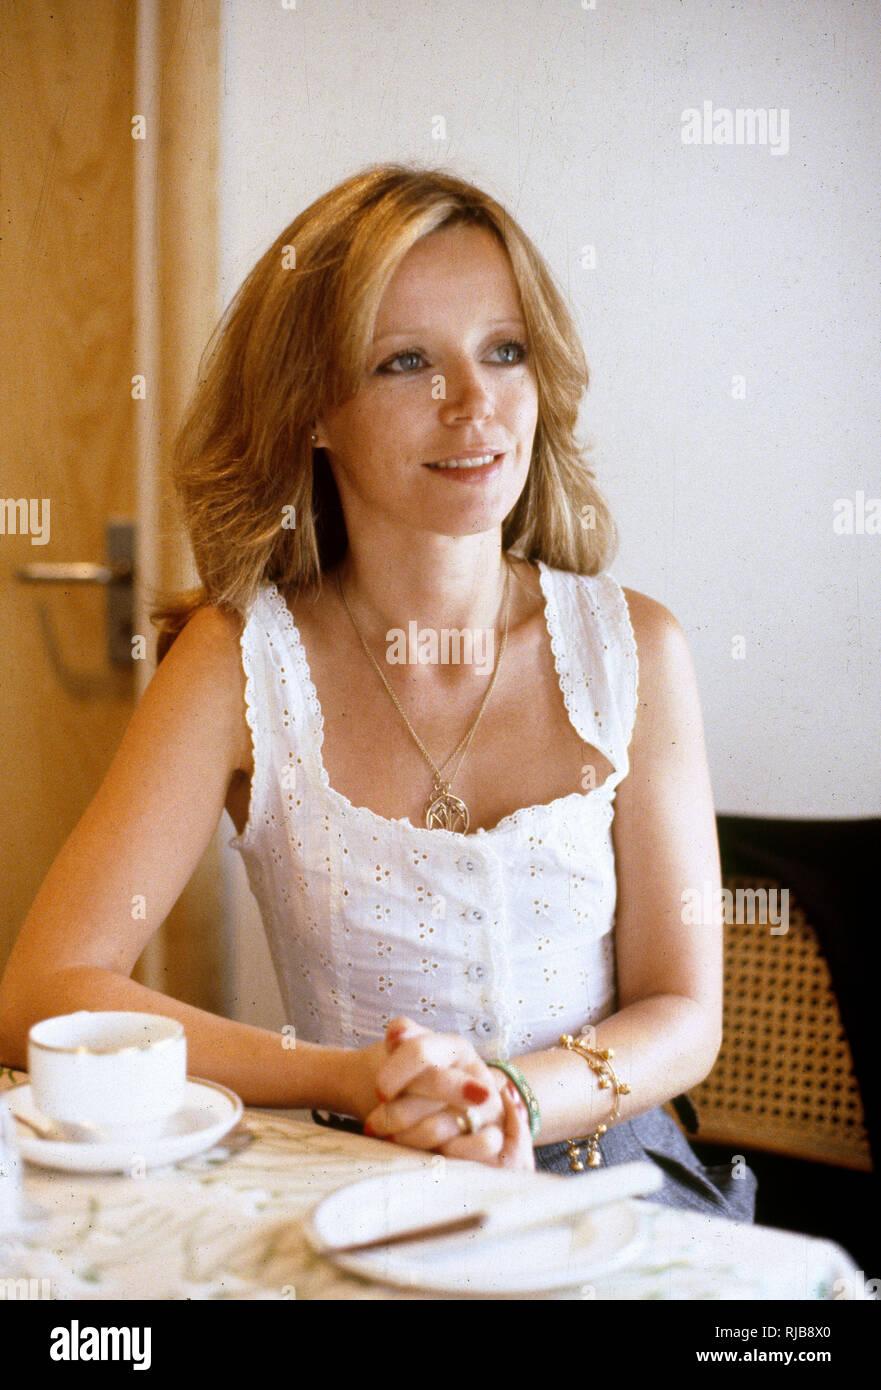 Gloria LeRoy,Molly Dunsworth Adult images Julia Murney,Mariel Hemingway born November 22, 1961 (age 56)